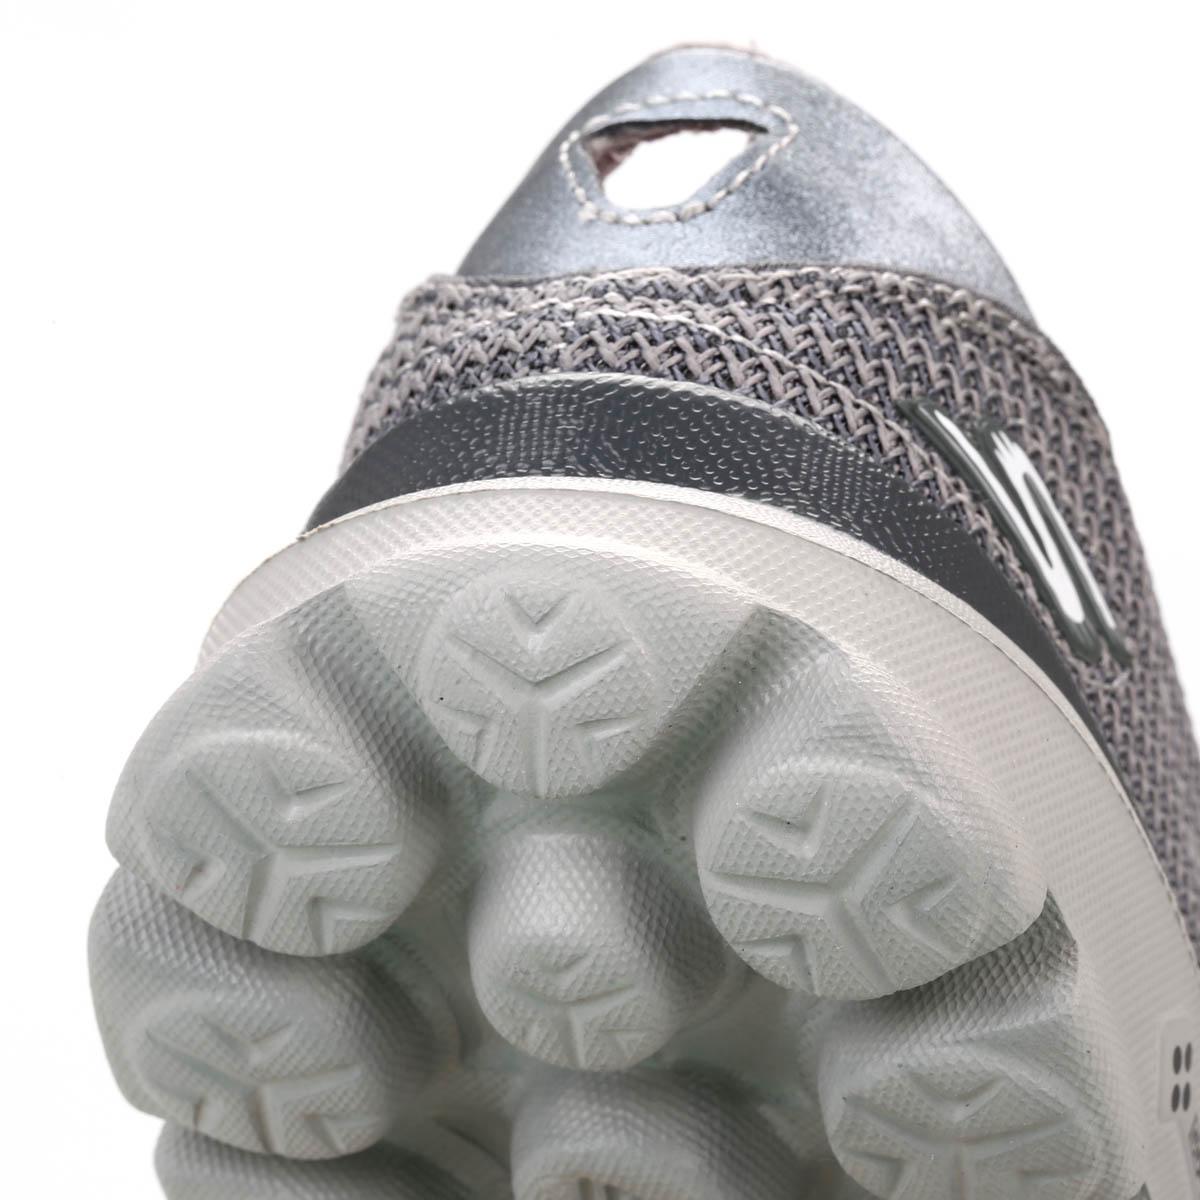 Skechers Gowalk 3 Zapatos Slip-on Caminar LqLaKHHzmm